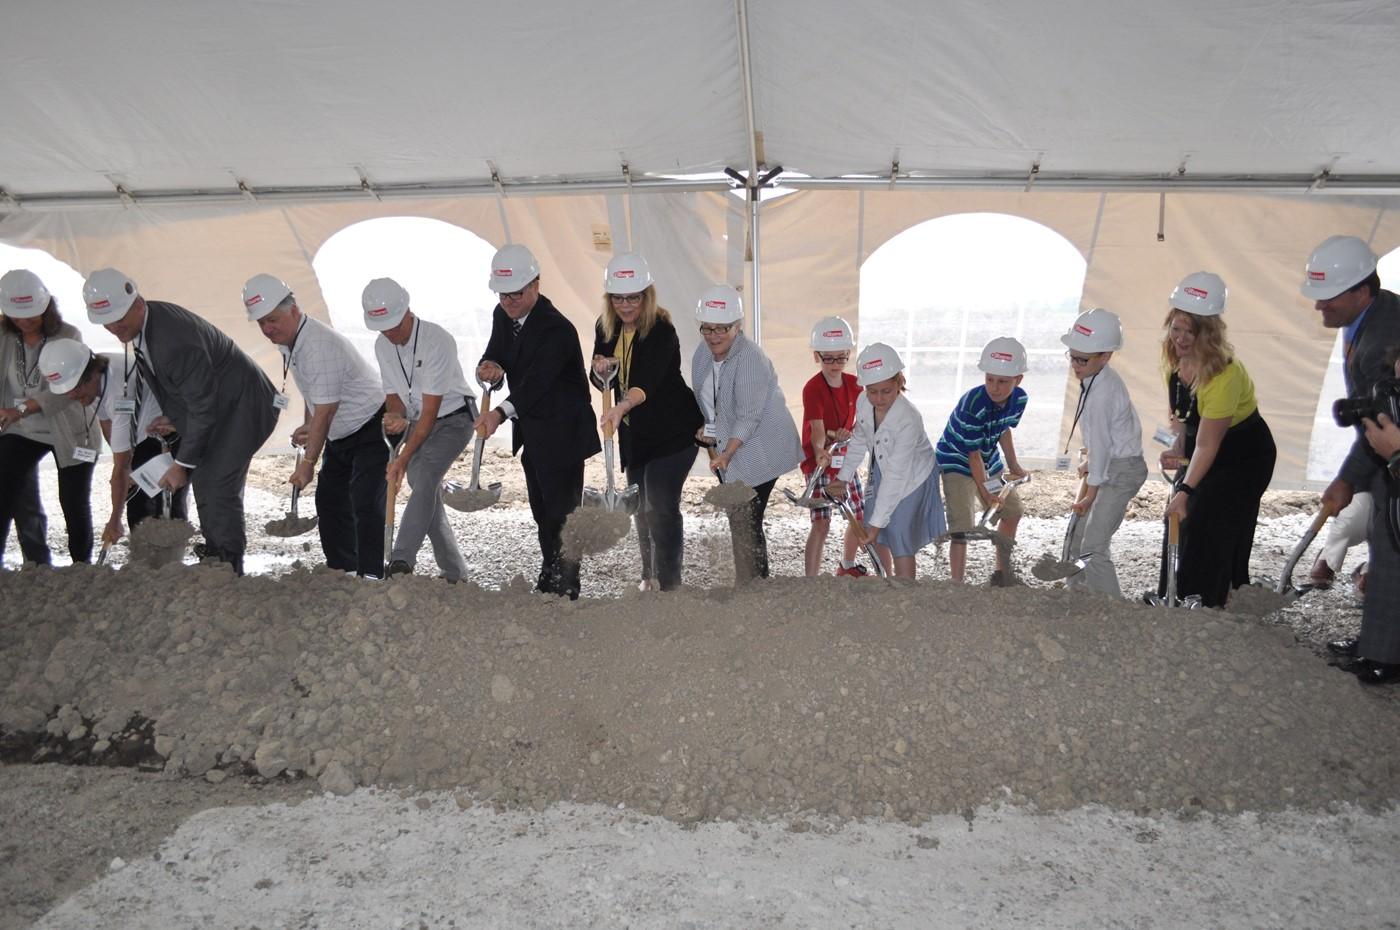 Groundbreaking Ceremony on June 23, 2016